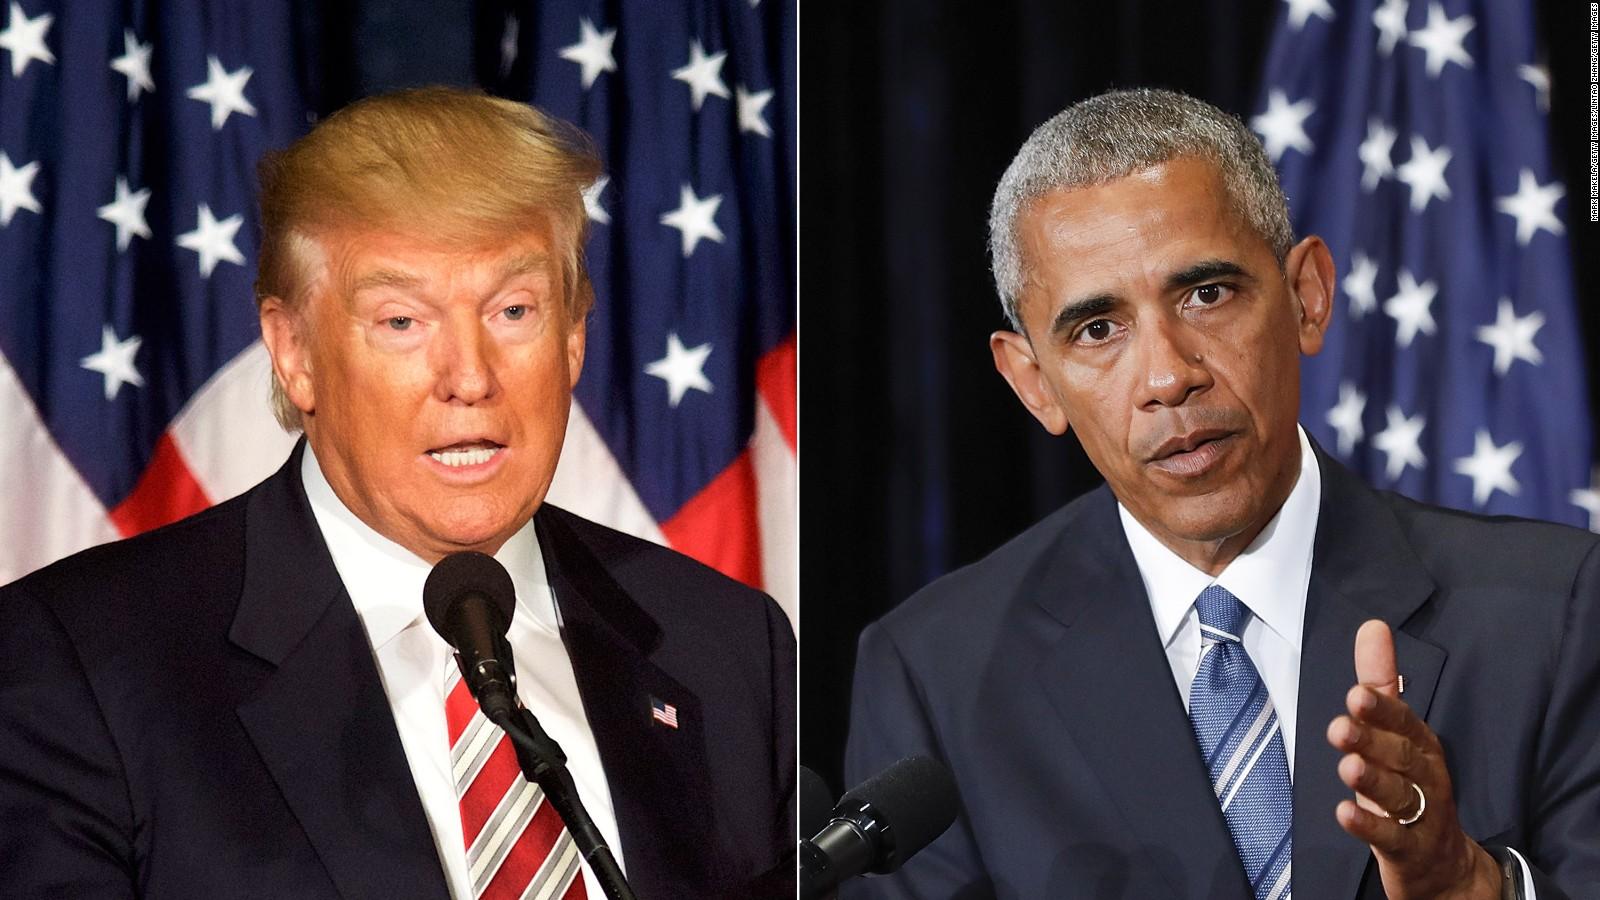 https://cdn.cnn.com/cnnnext/dam/assets/160908095621-trump-obama-hp-split-0908-full-169.jpg